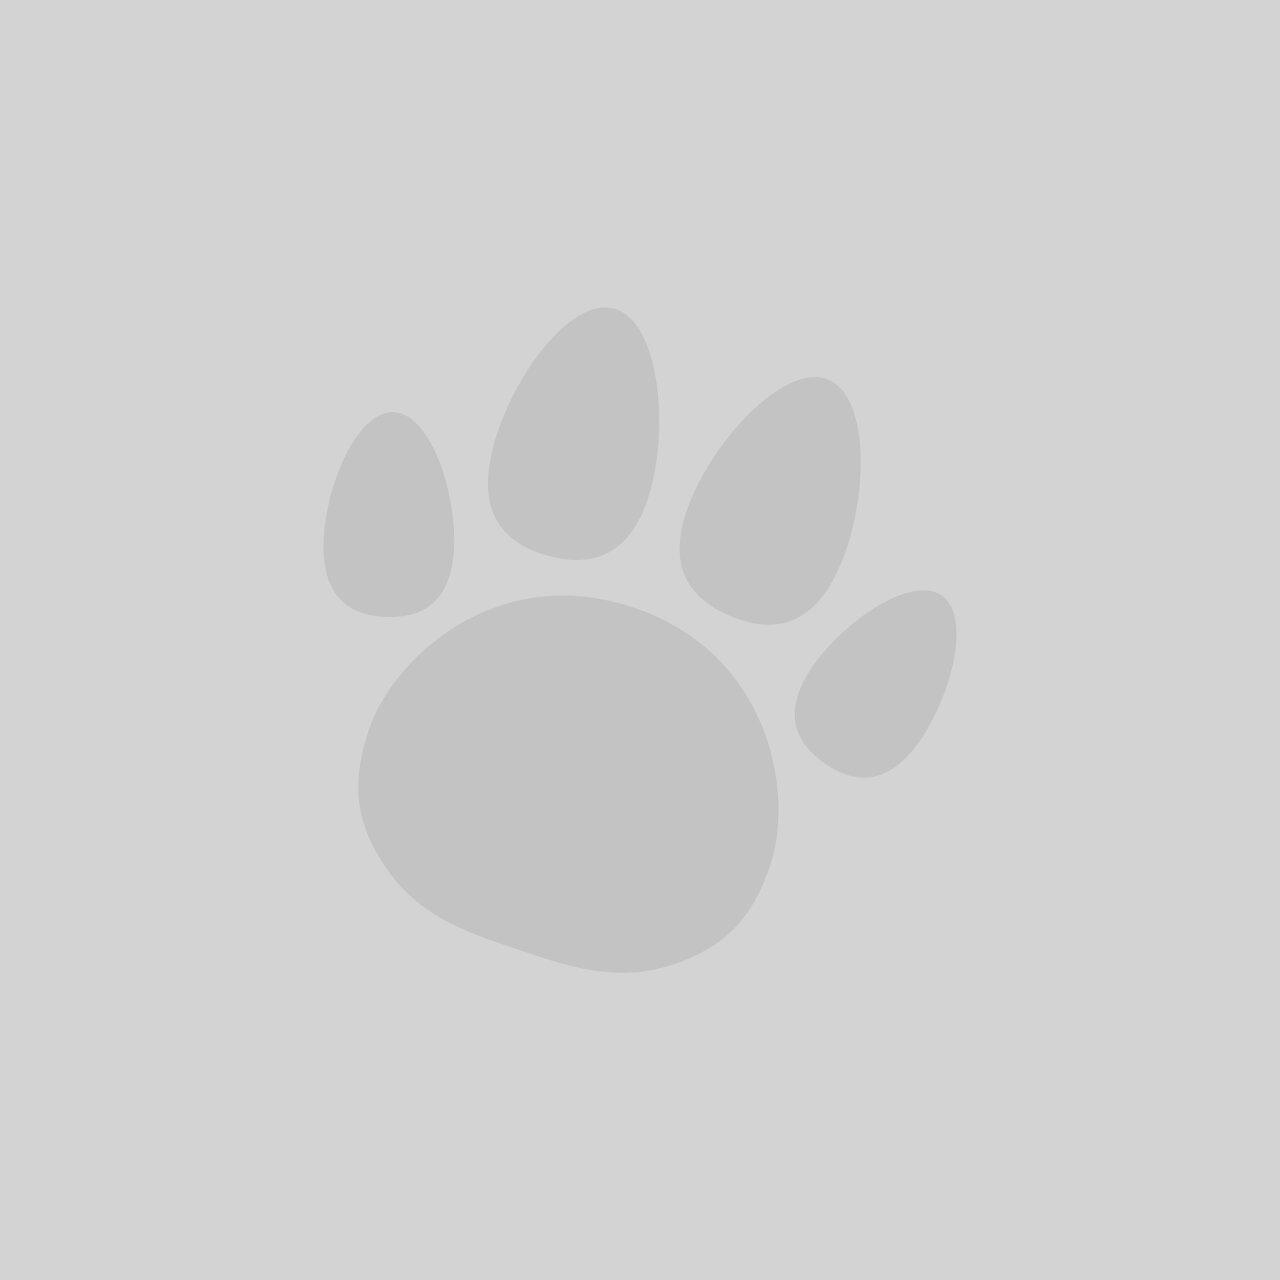 Webbox Cats Delight Tasty Sticks Beef & Rabbit 6 Pack